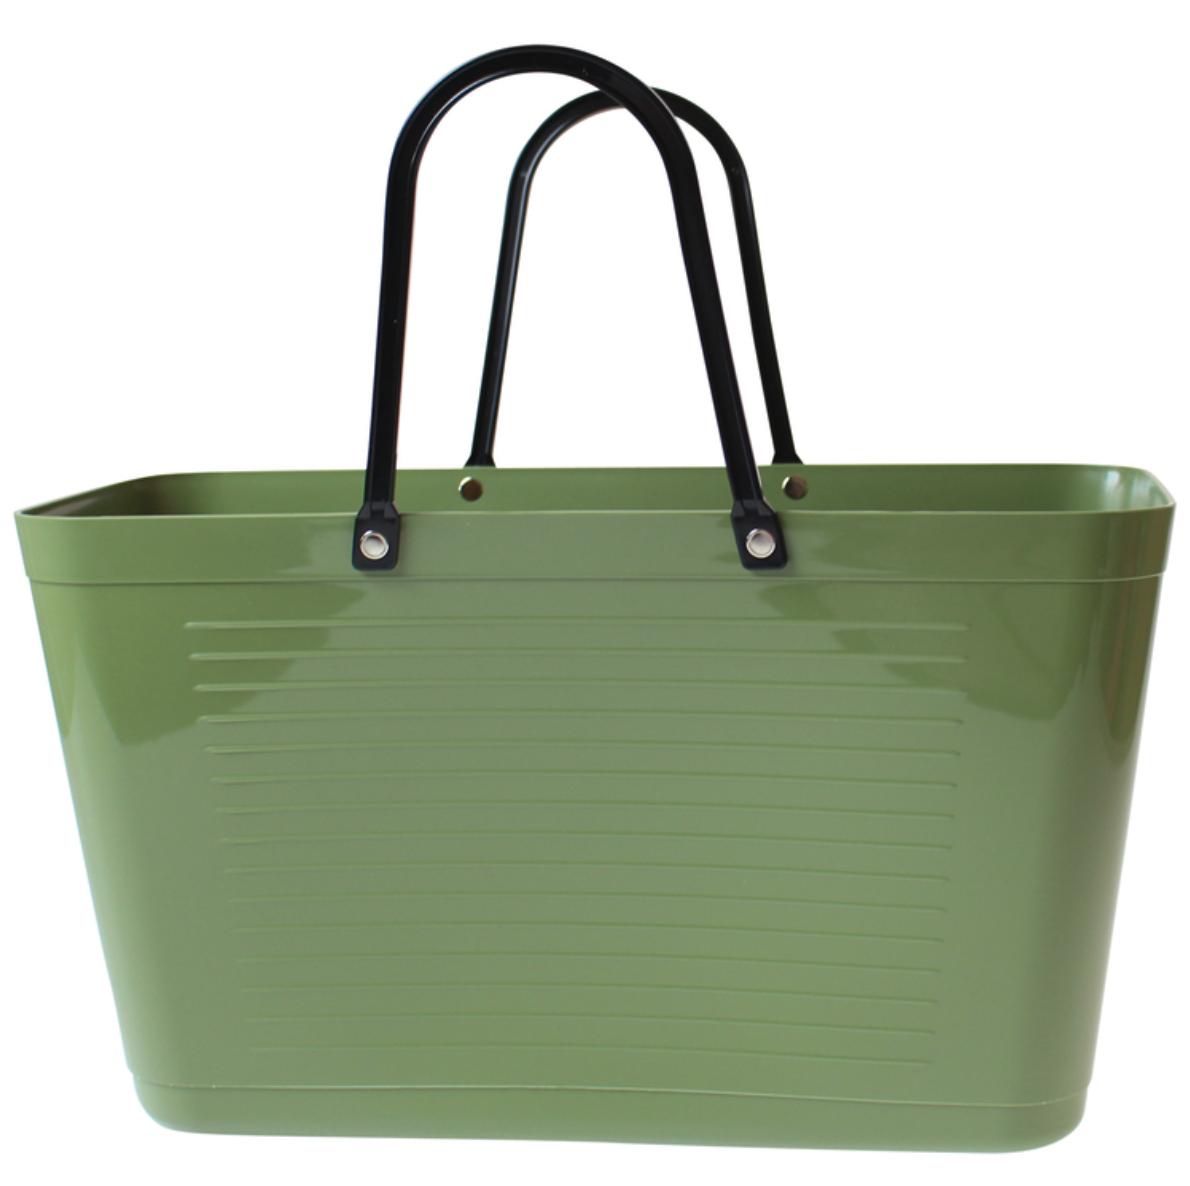 "tragetasche ""original"", 43 x 18 x 24 cm, 100 % recycelbares polyethylen, perstorpdesign"